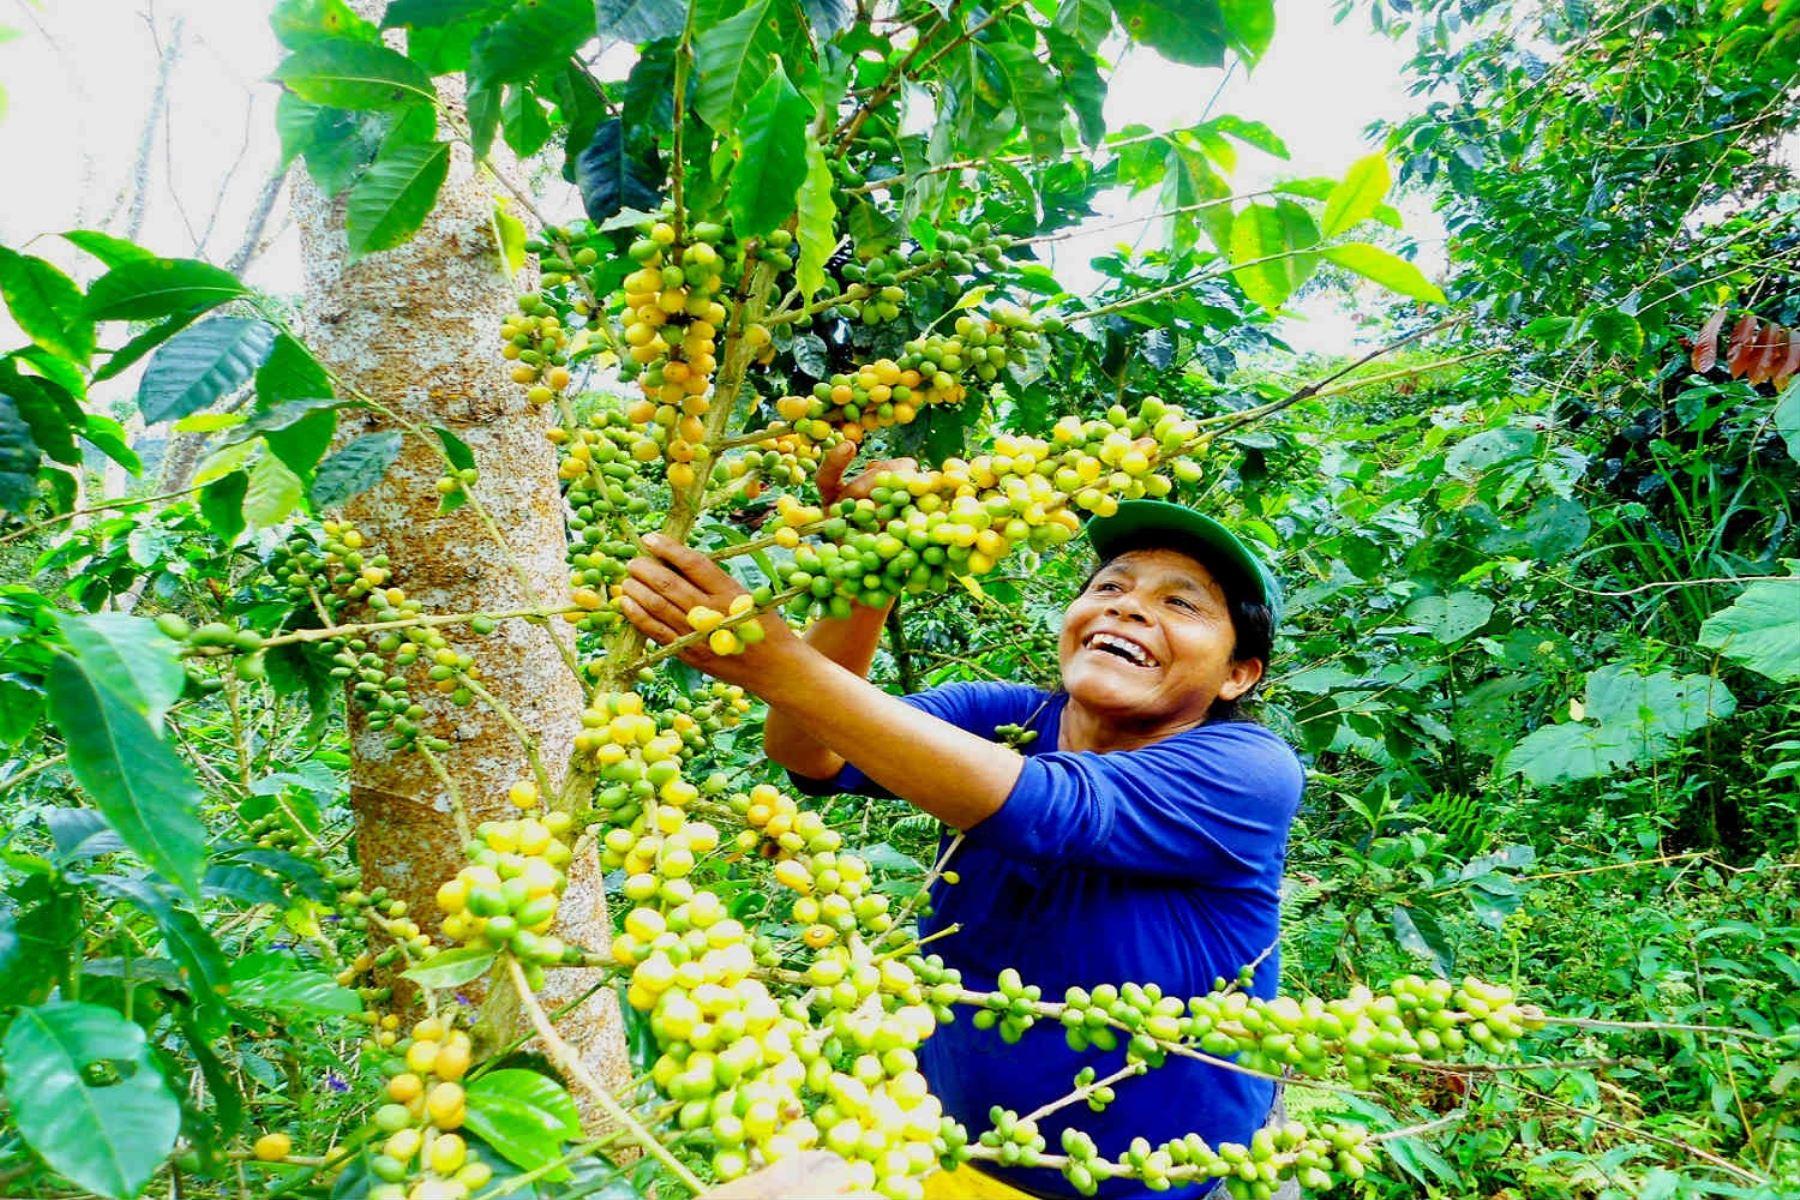 Repunte del sector agrario. ANDINA/Difusión